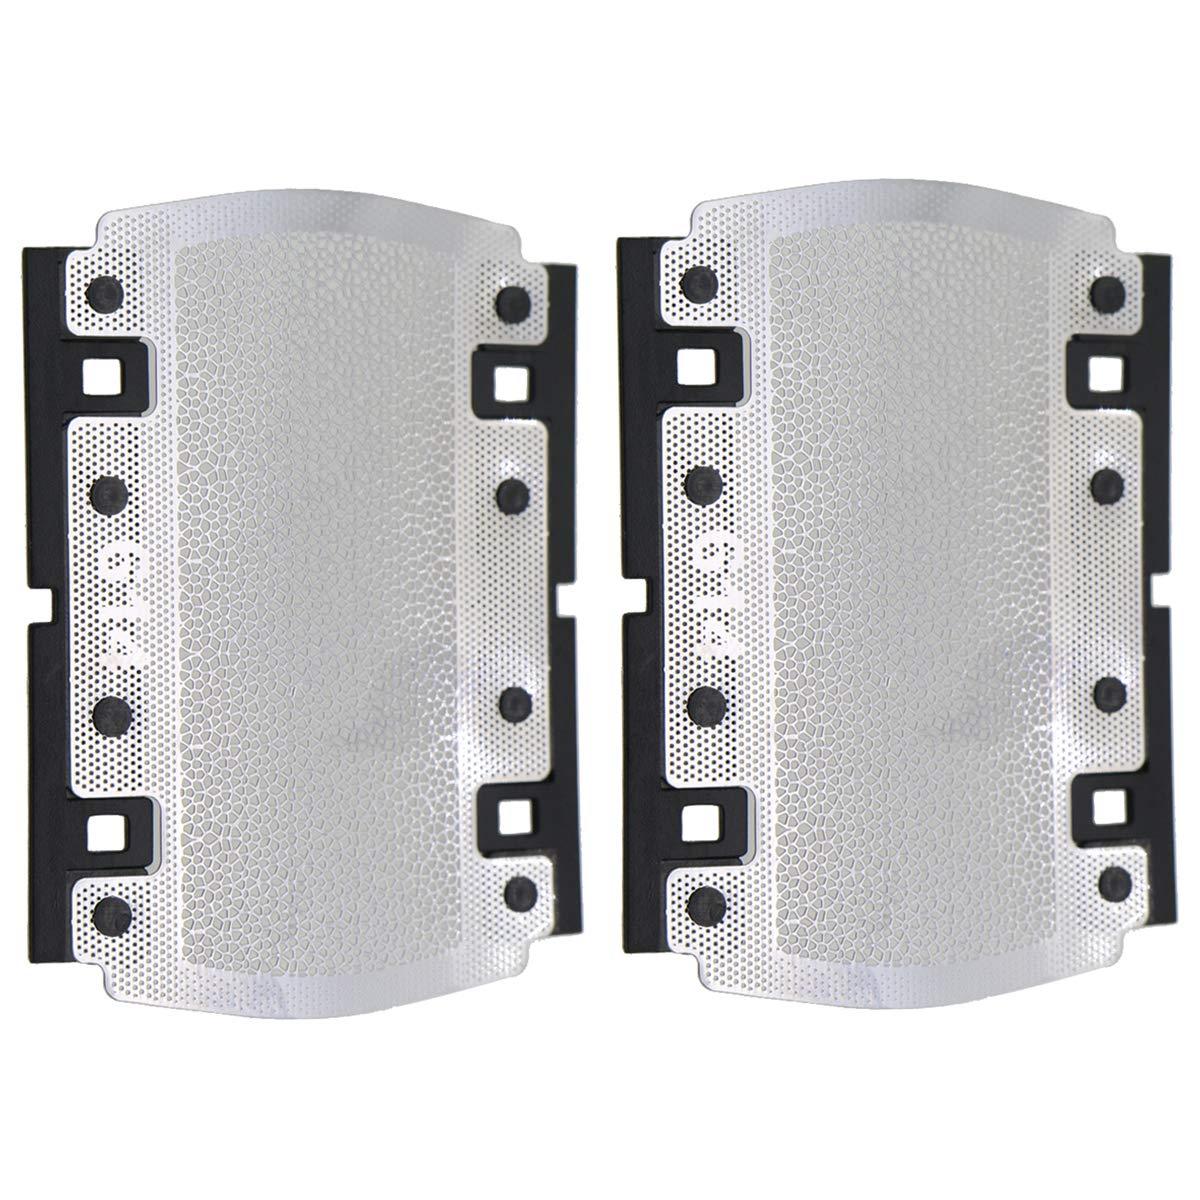 WyFun Foil Screen for Braun Pocketgo Pocket Twist E-Razor 614 350 355 370 375 5614 5615 P10 Shaver Razor